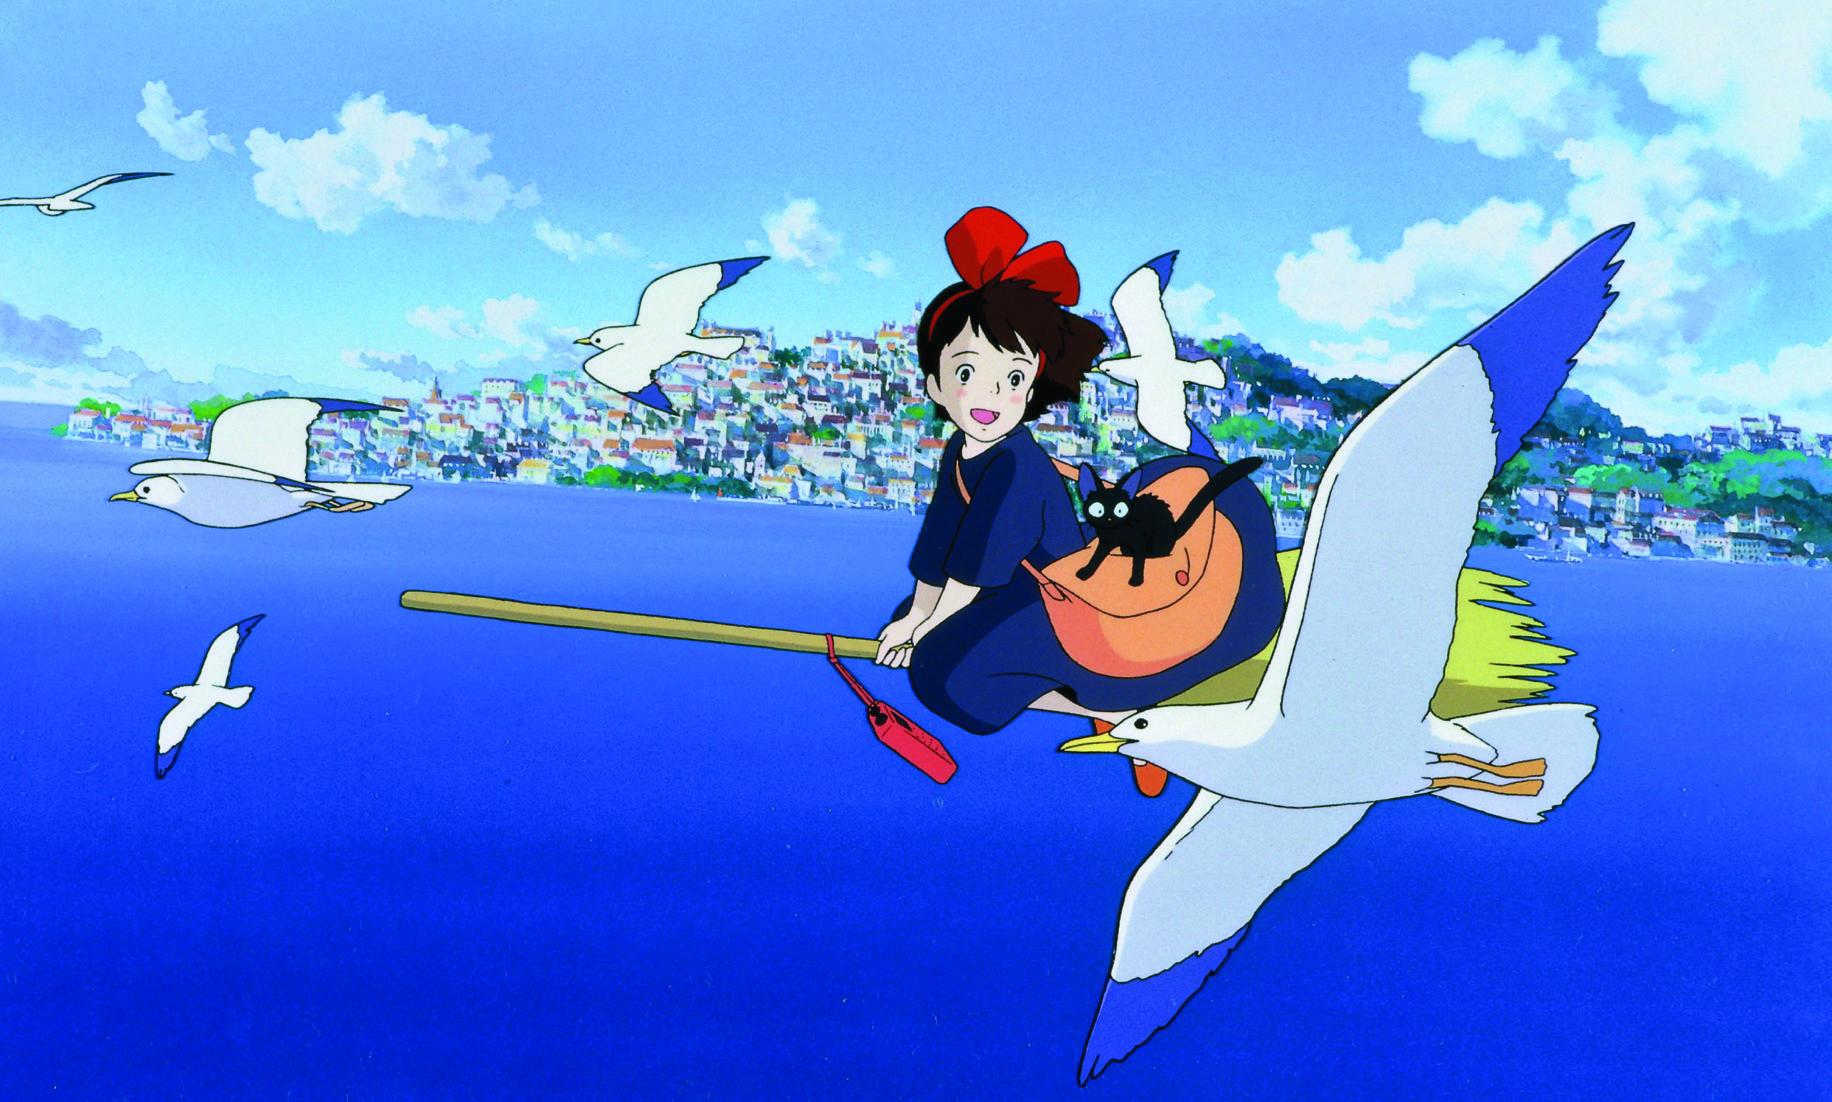 Win Tickets to Studio Ghibli Fest 2017's Presentation of 'Kiki's Delivery Service'!